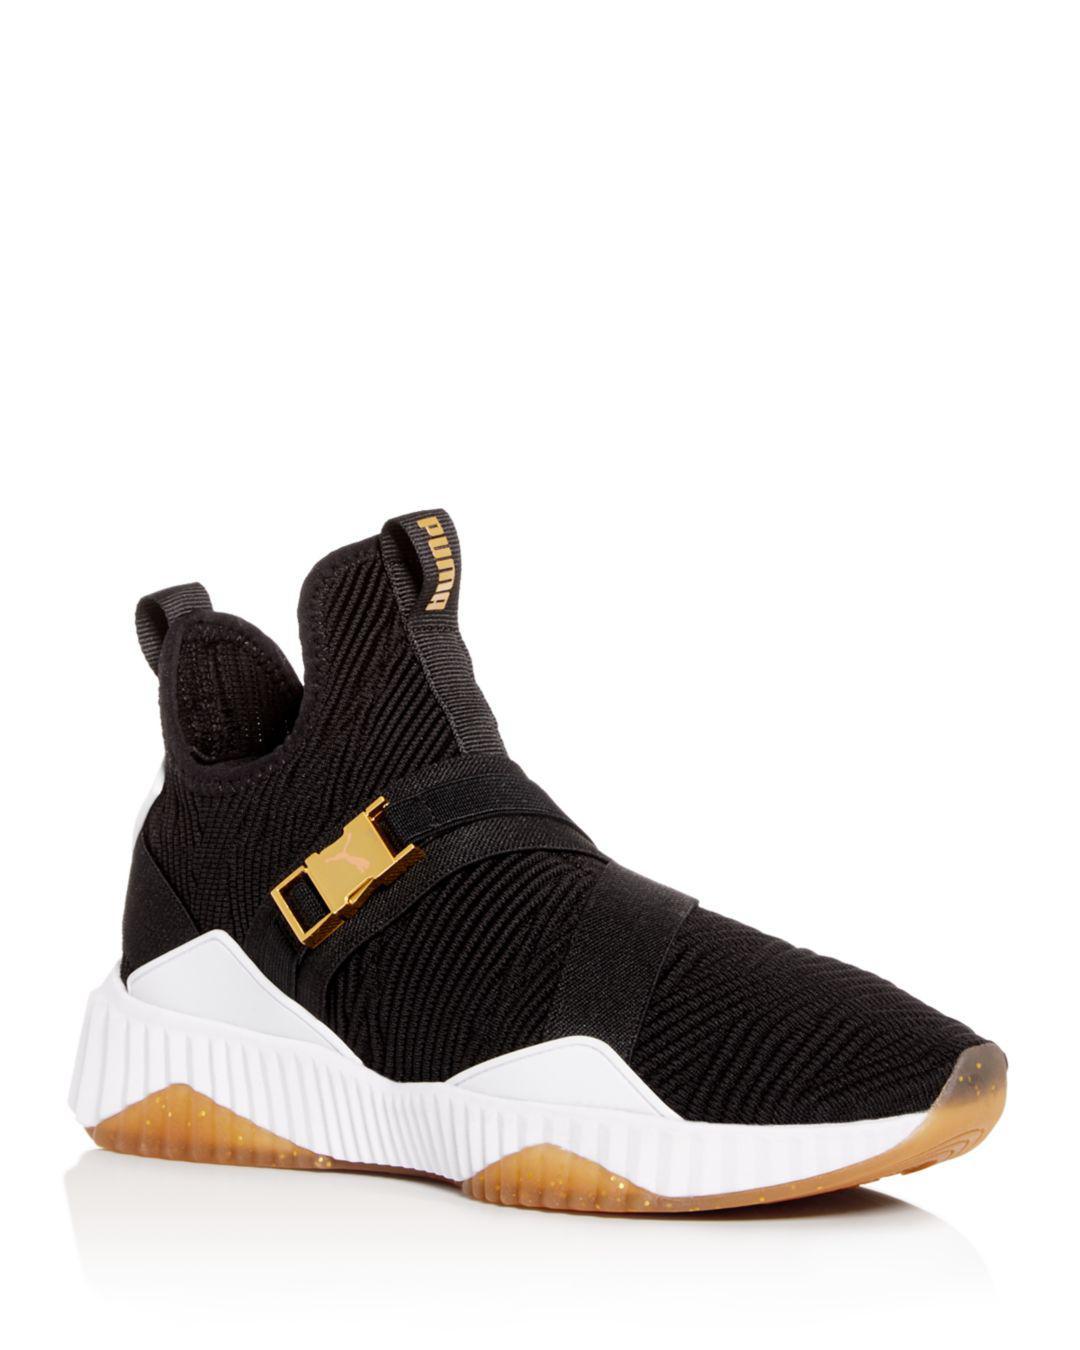 a3e4d5c4677655 PUMA Defy Mid Sneaker in Black - Lyst